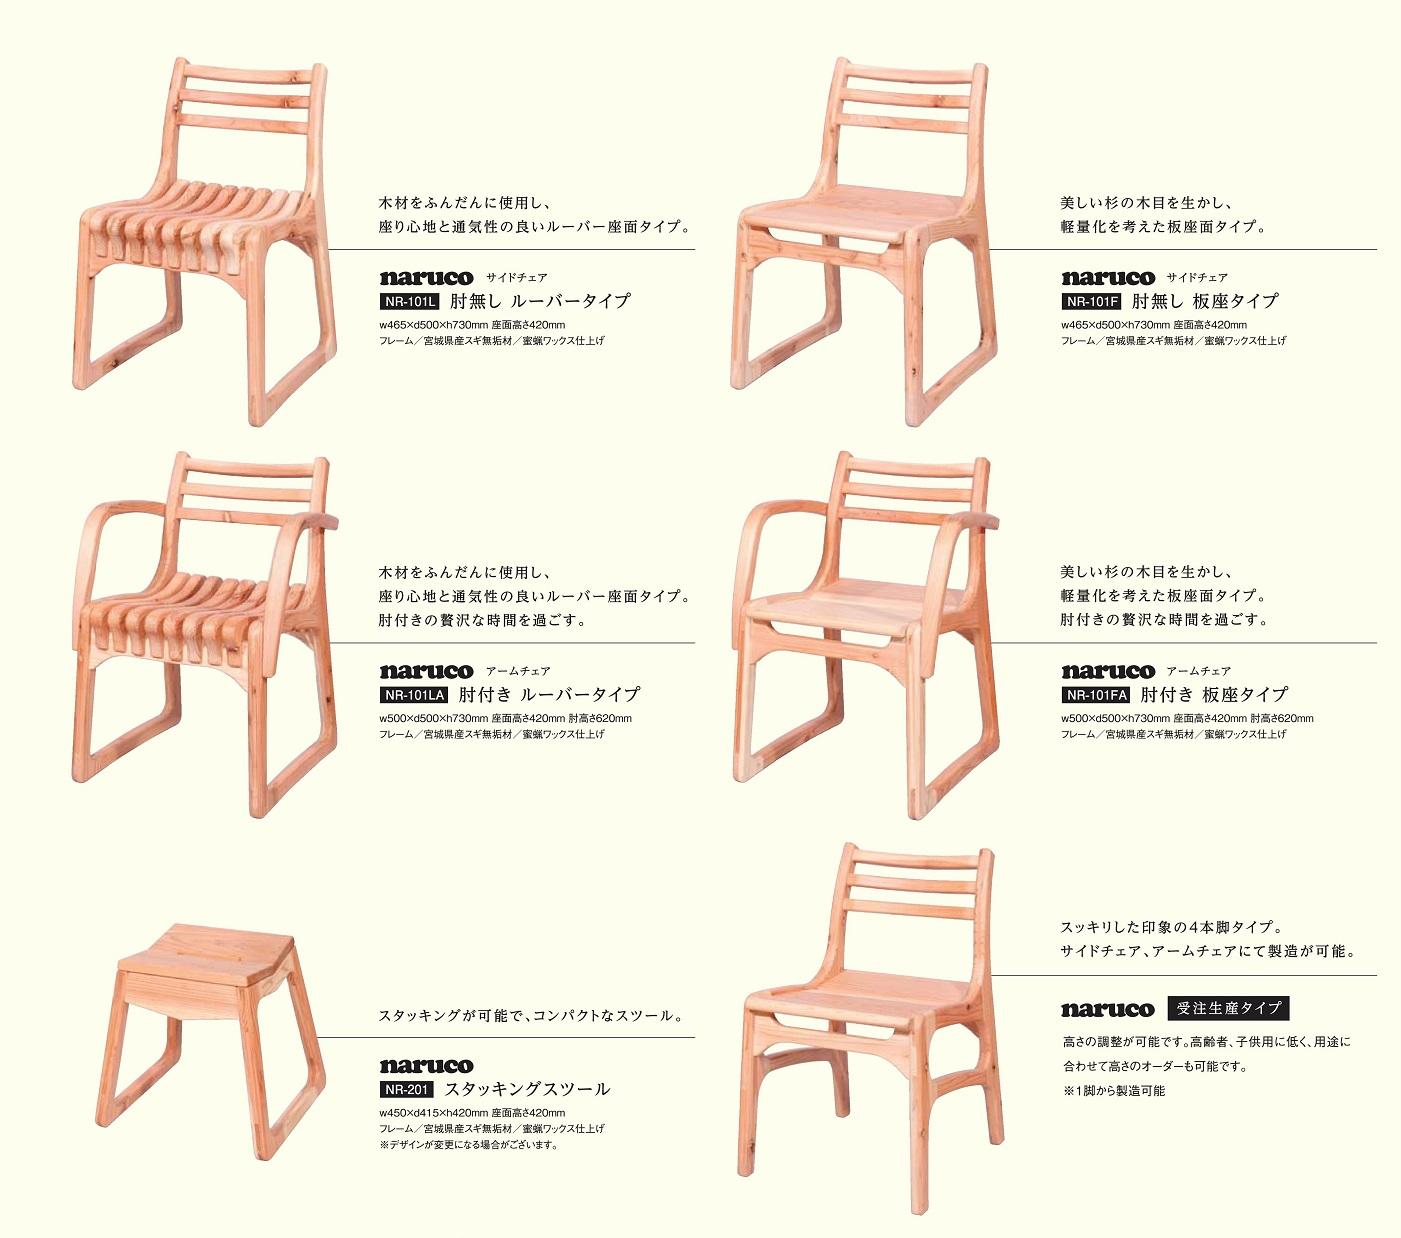 http://www.sustainalife.co.jp/about/%E6%A4%85%E5%AD%90%E7%94%BB%E5%83%8F1.jpg